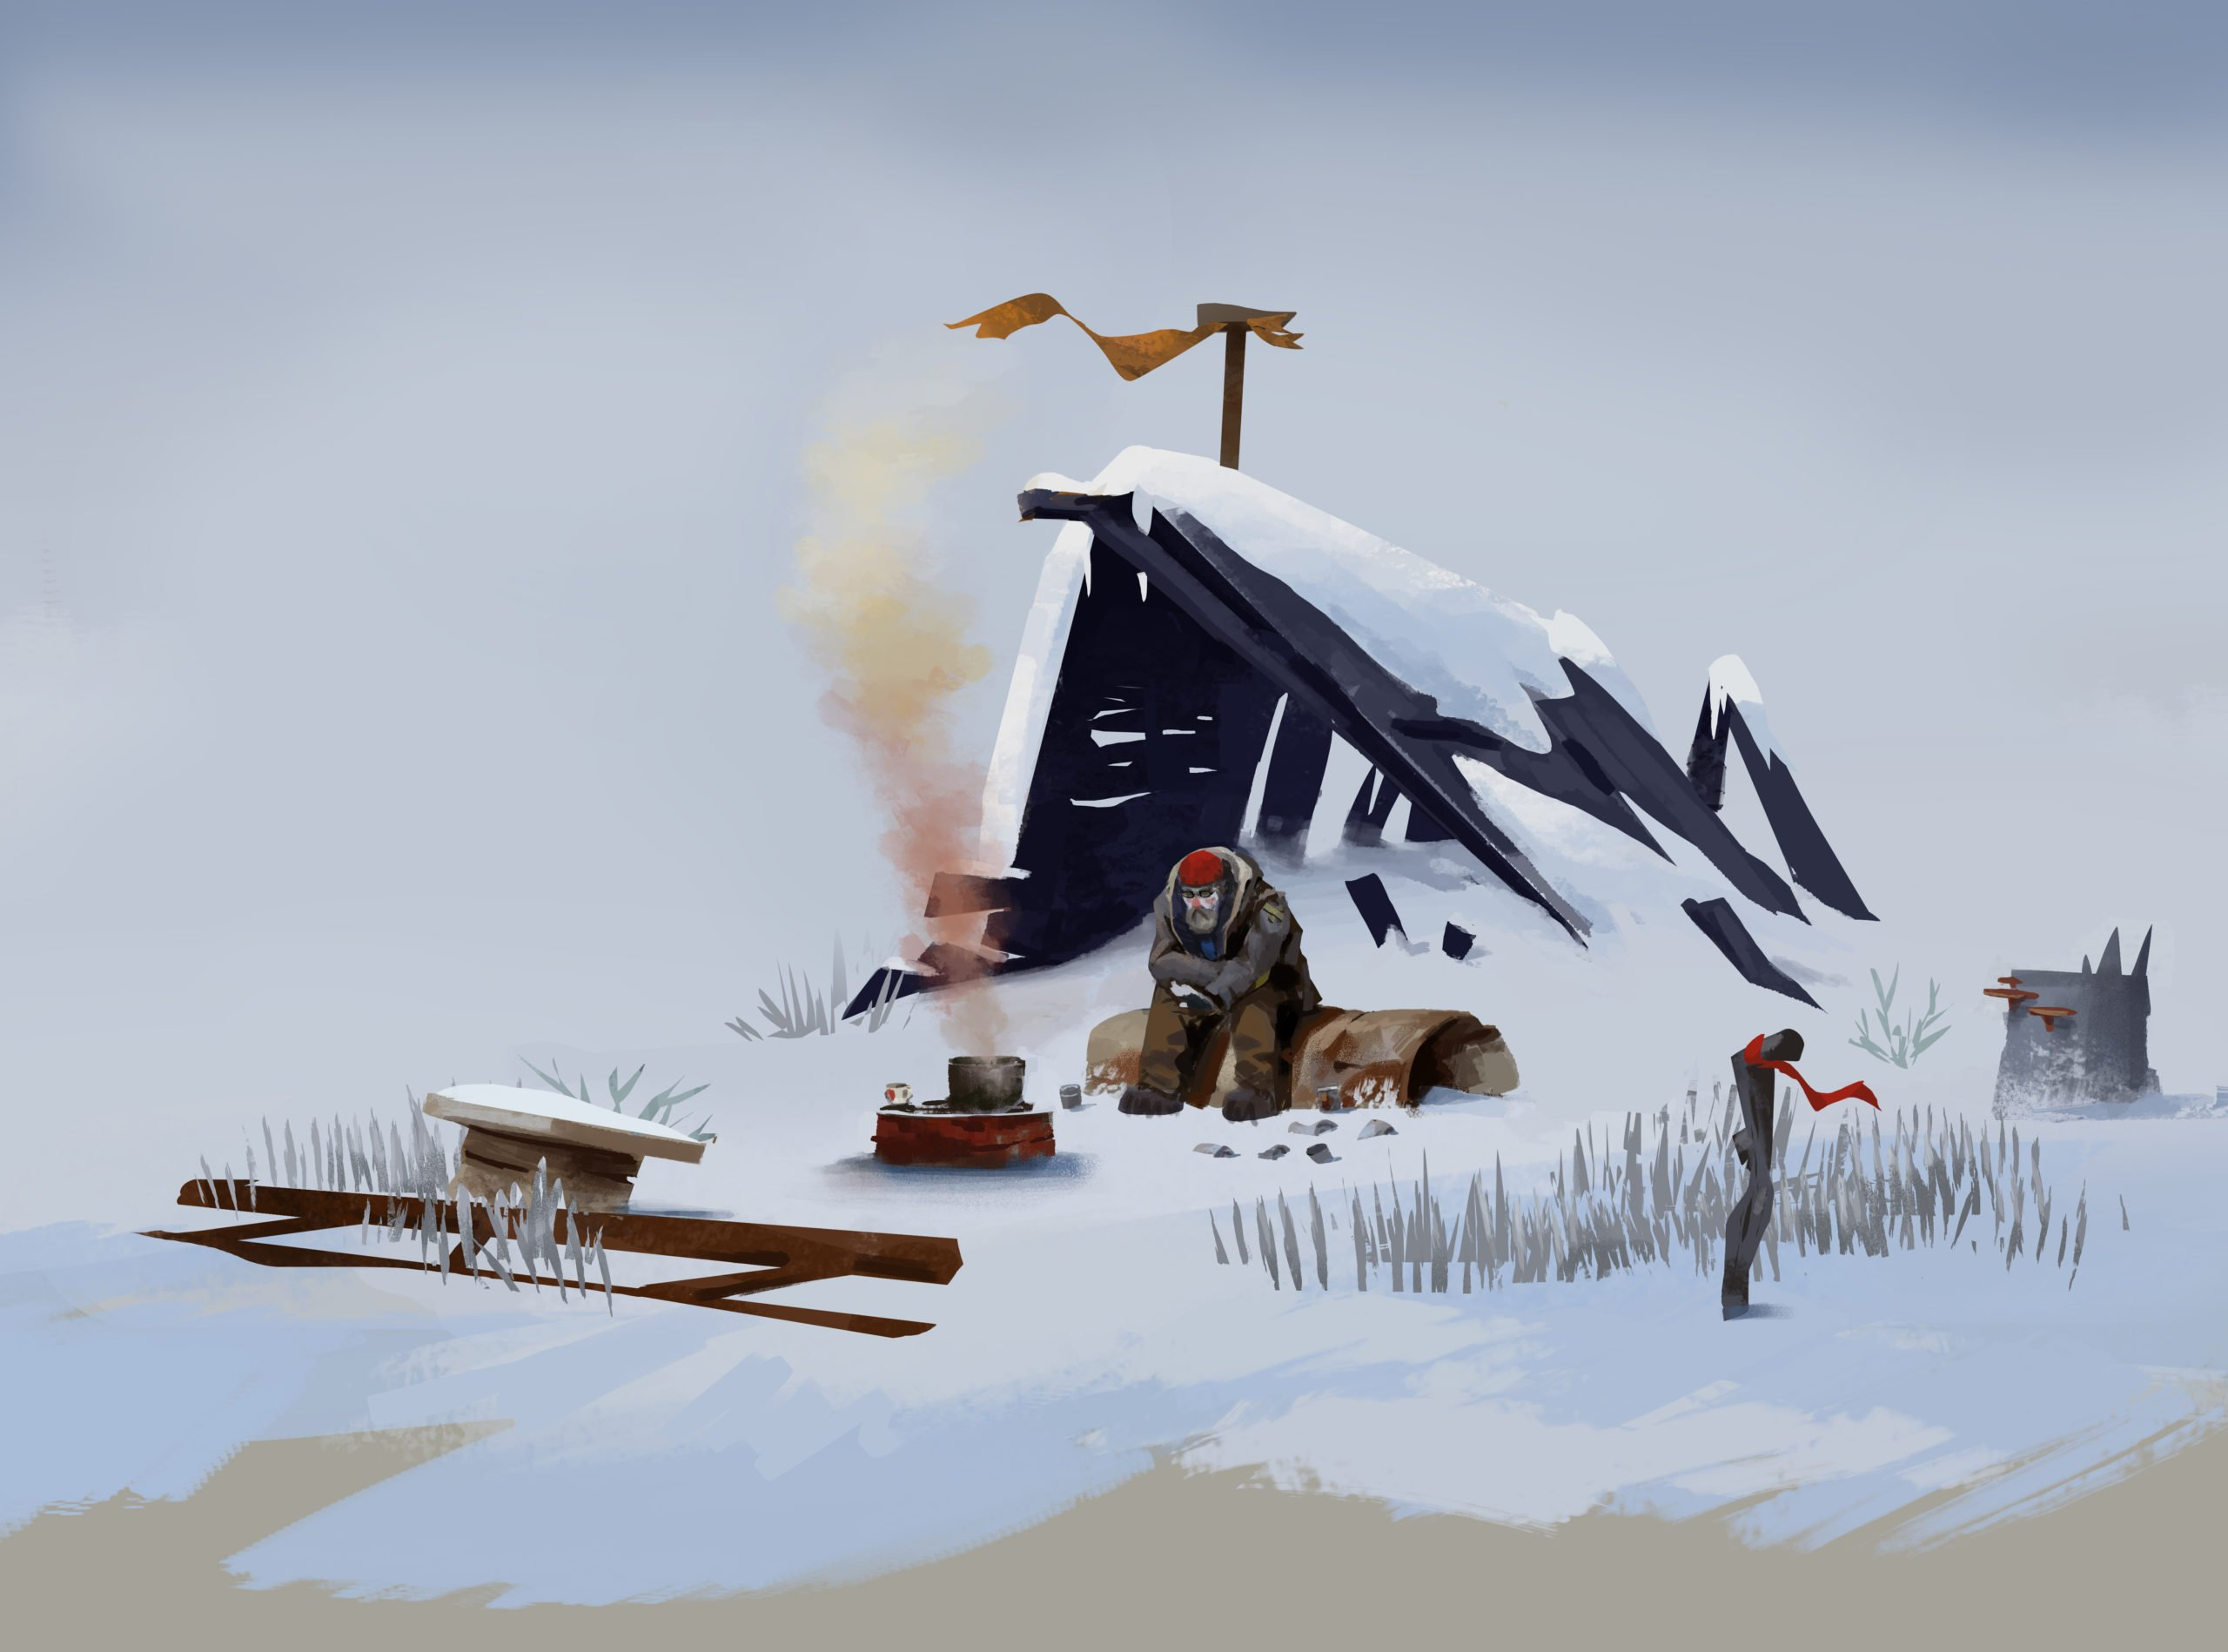 Hinterland Delays The Long Dark Wintermute Episode 3